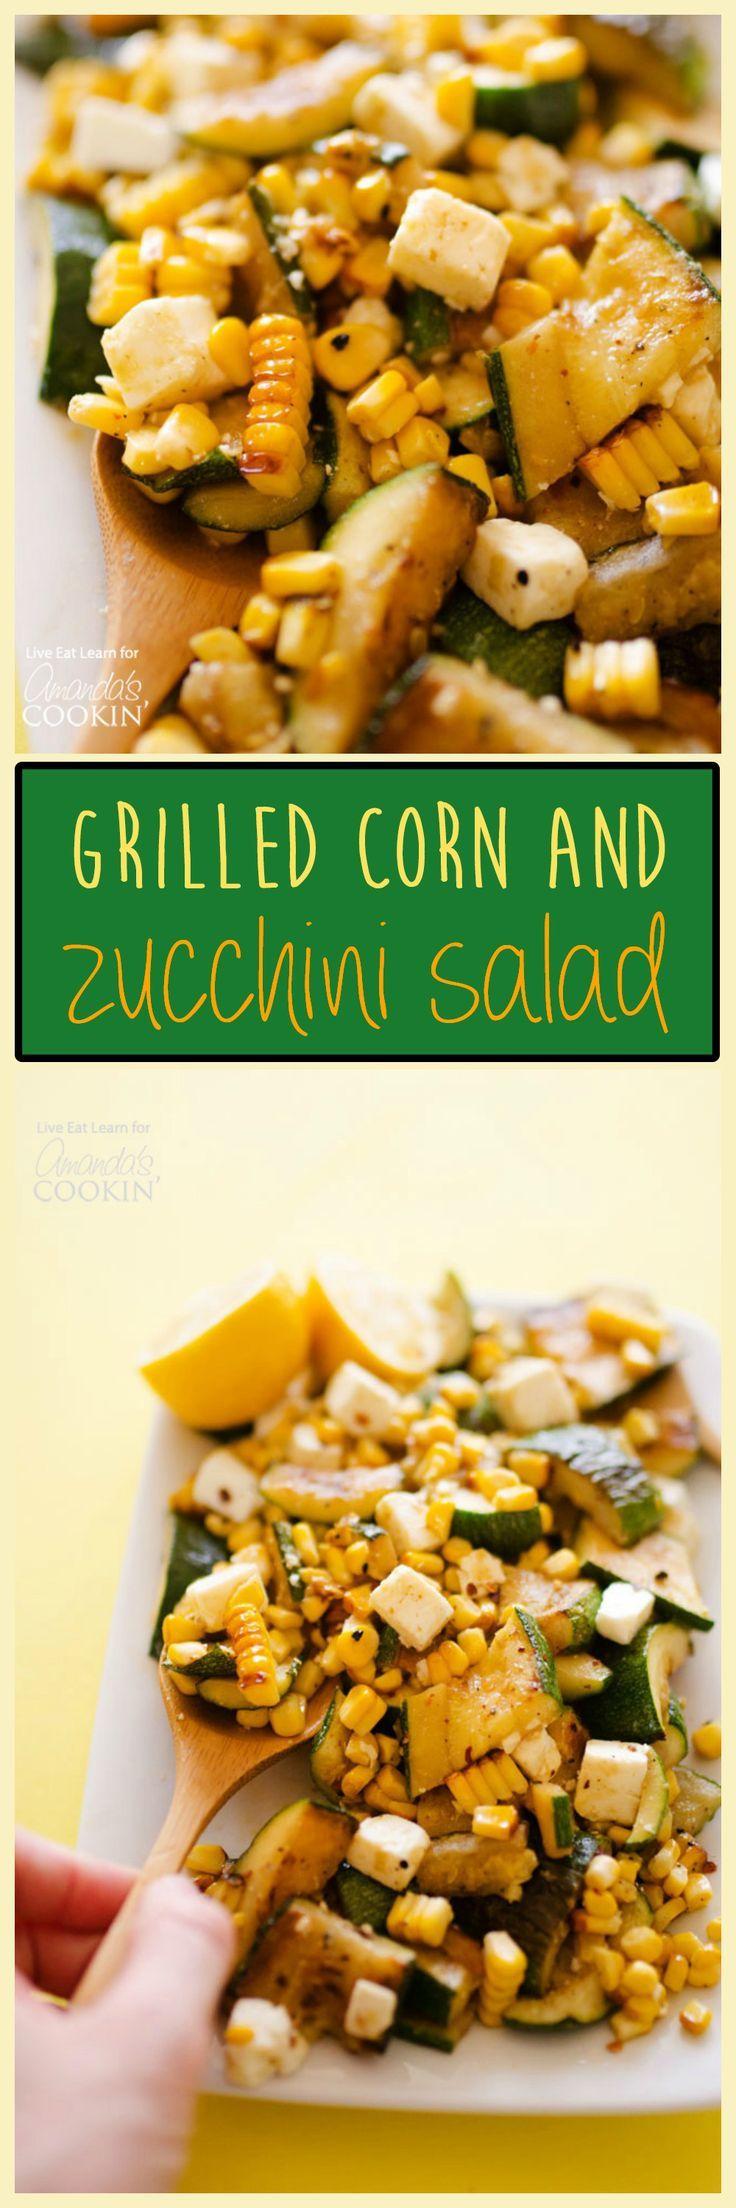 25+ best ideas about Zucchini Salad on Pinterest ...